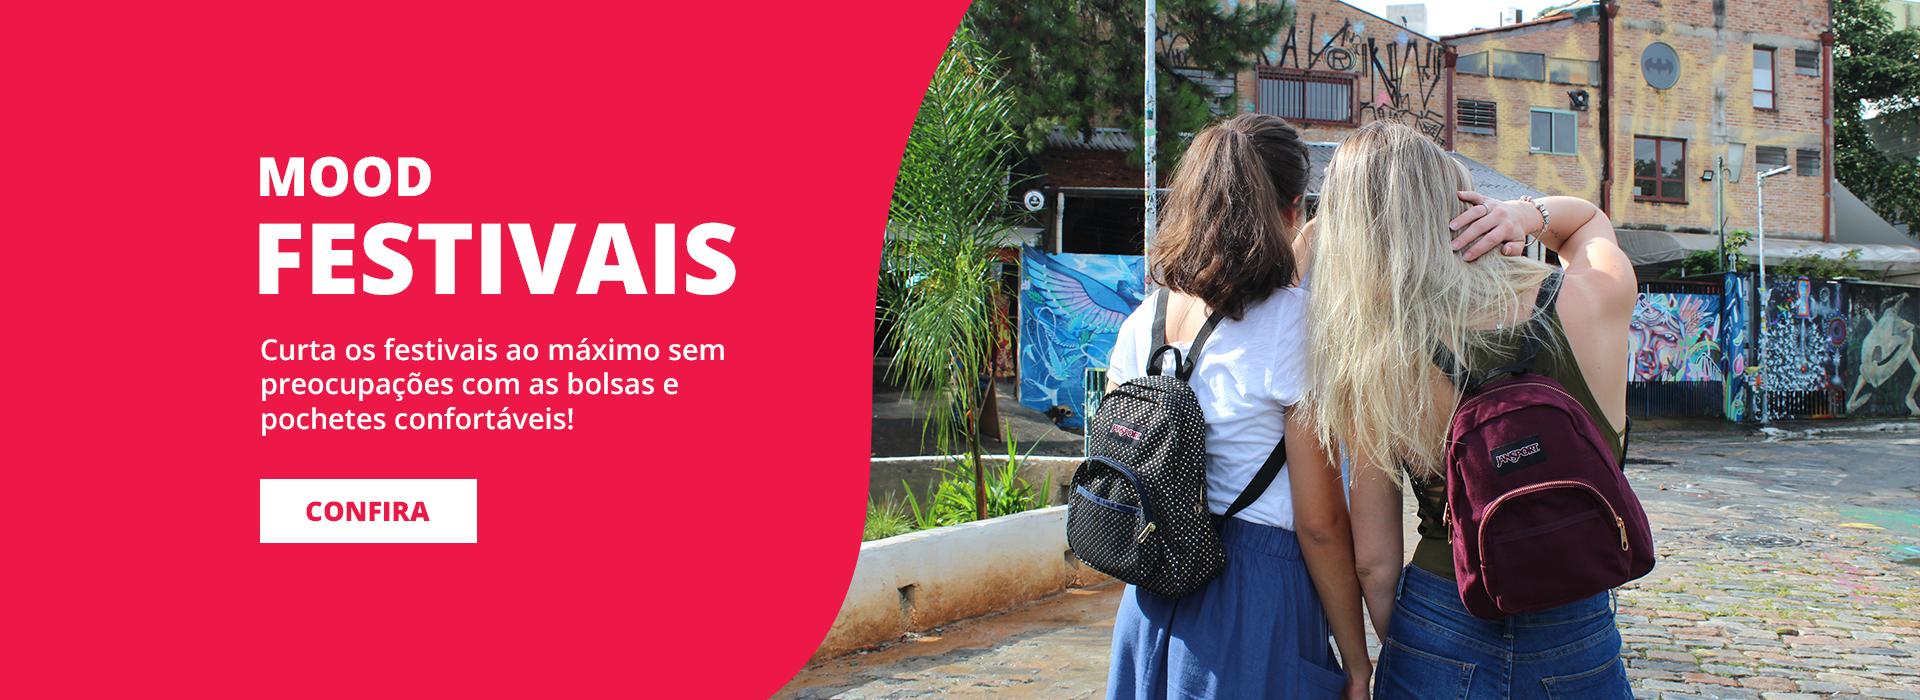 Banner 1 - Festivais